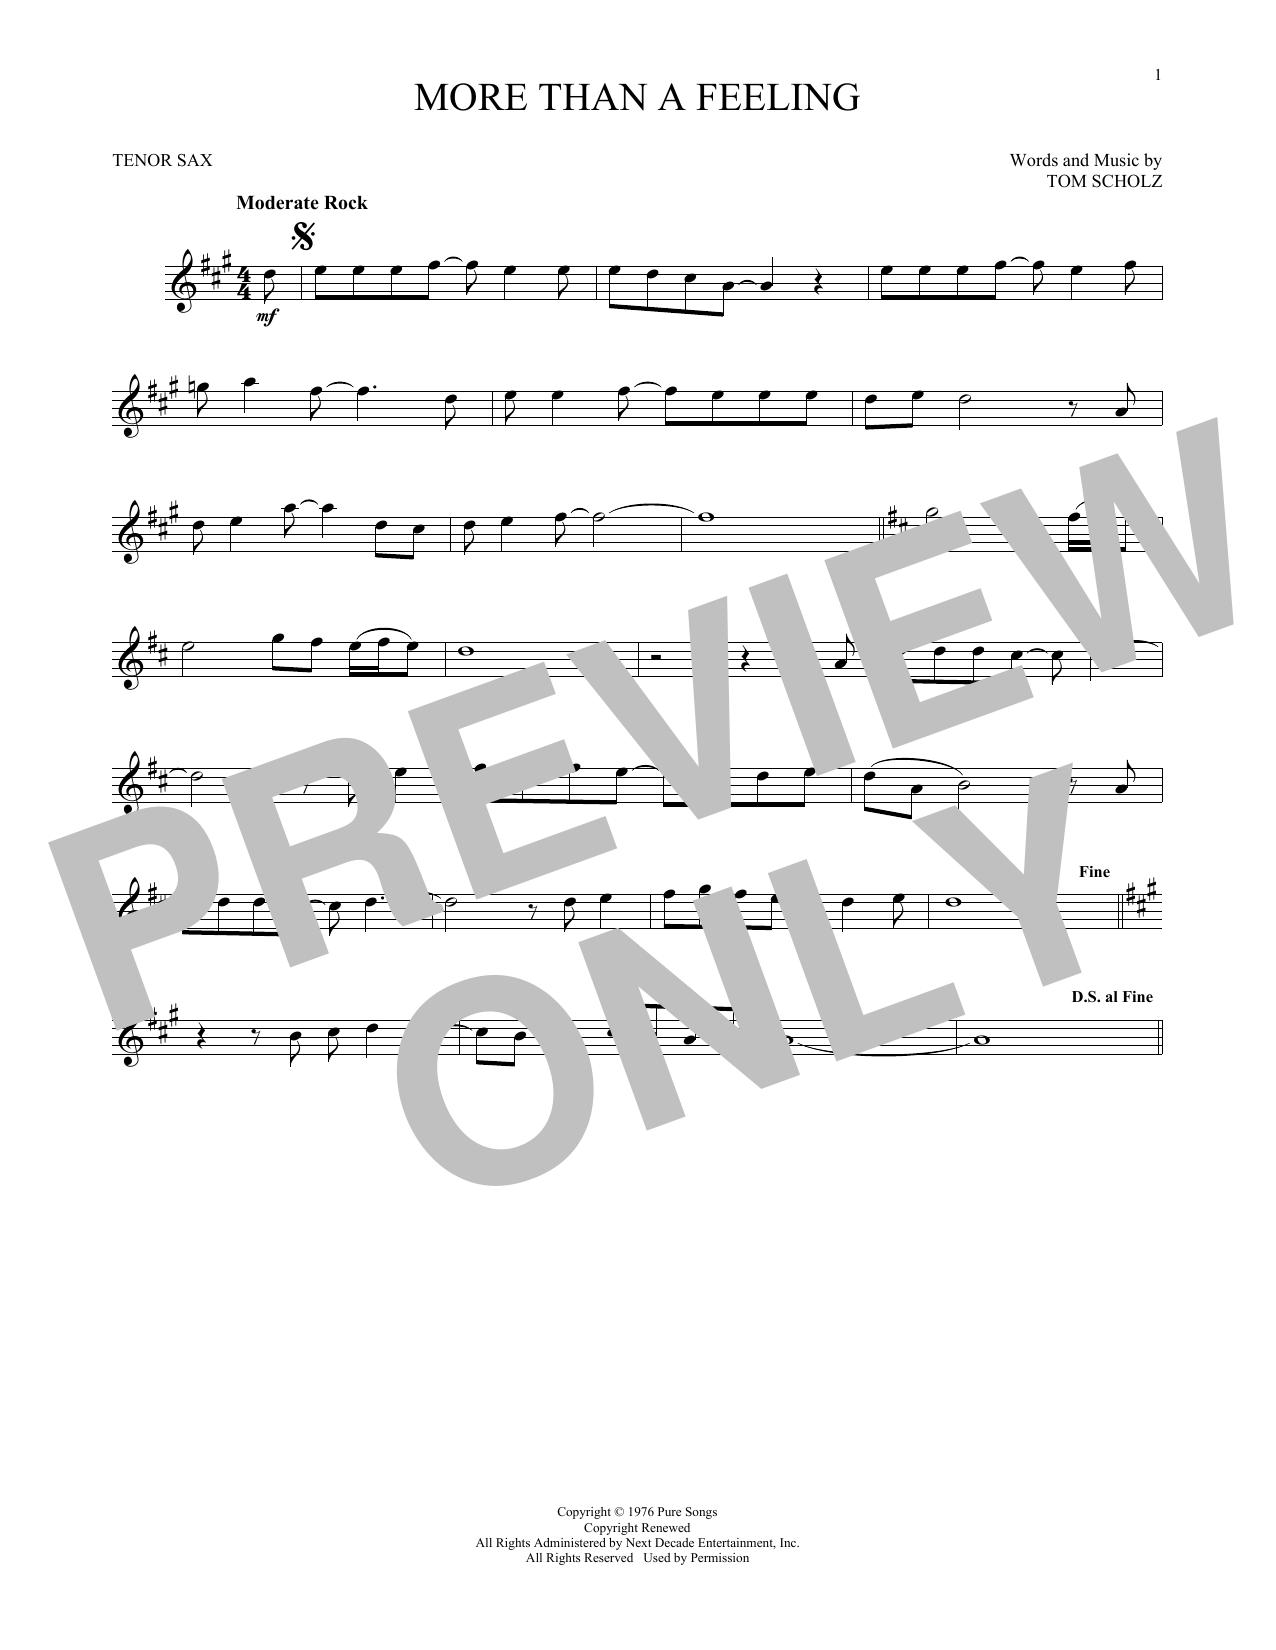 More Than A Feeling (Tenor Sax Solo)